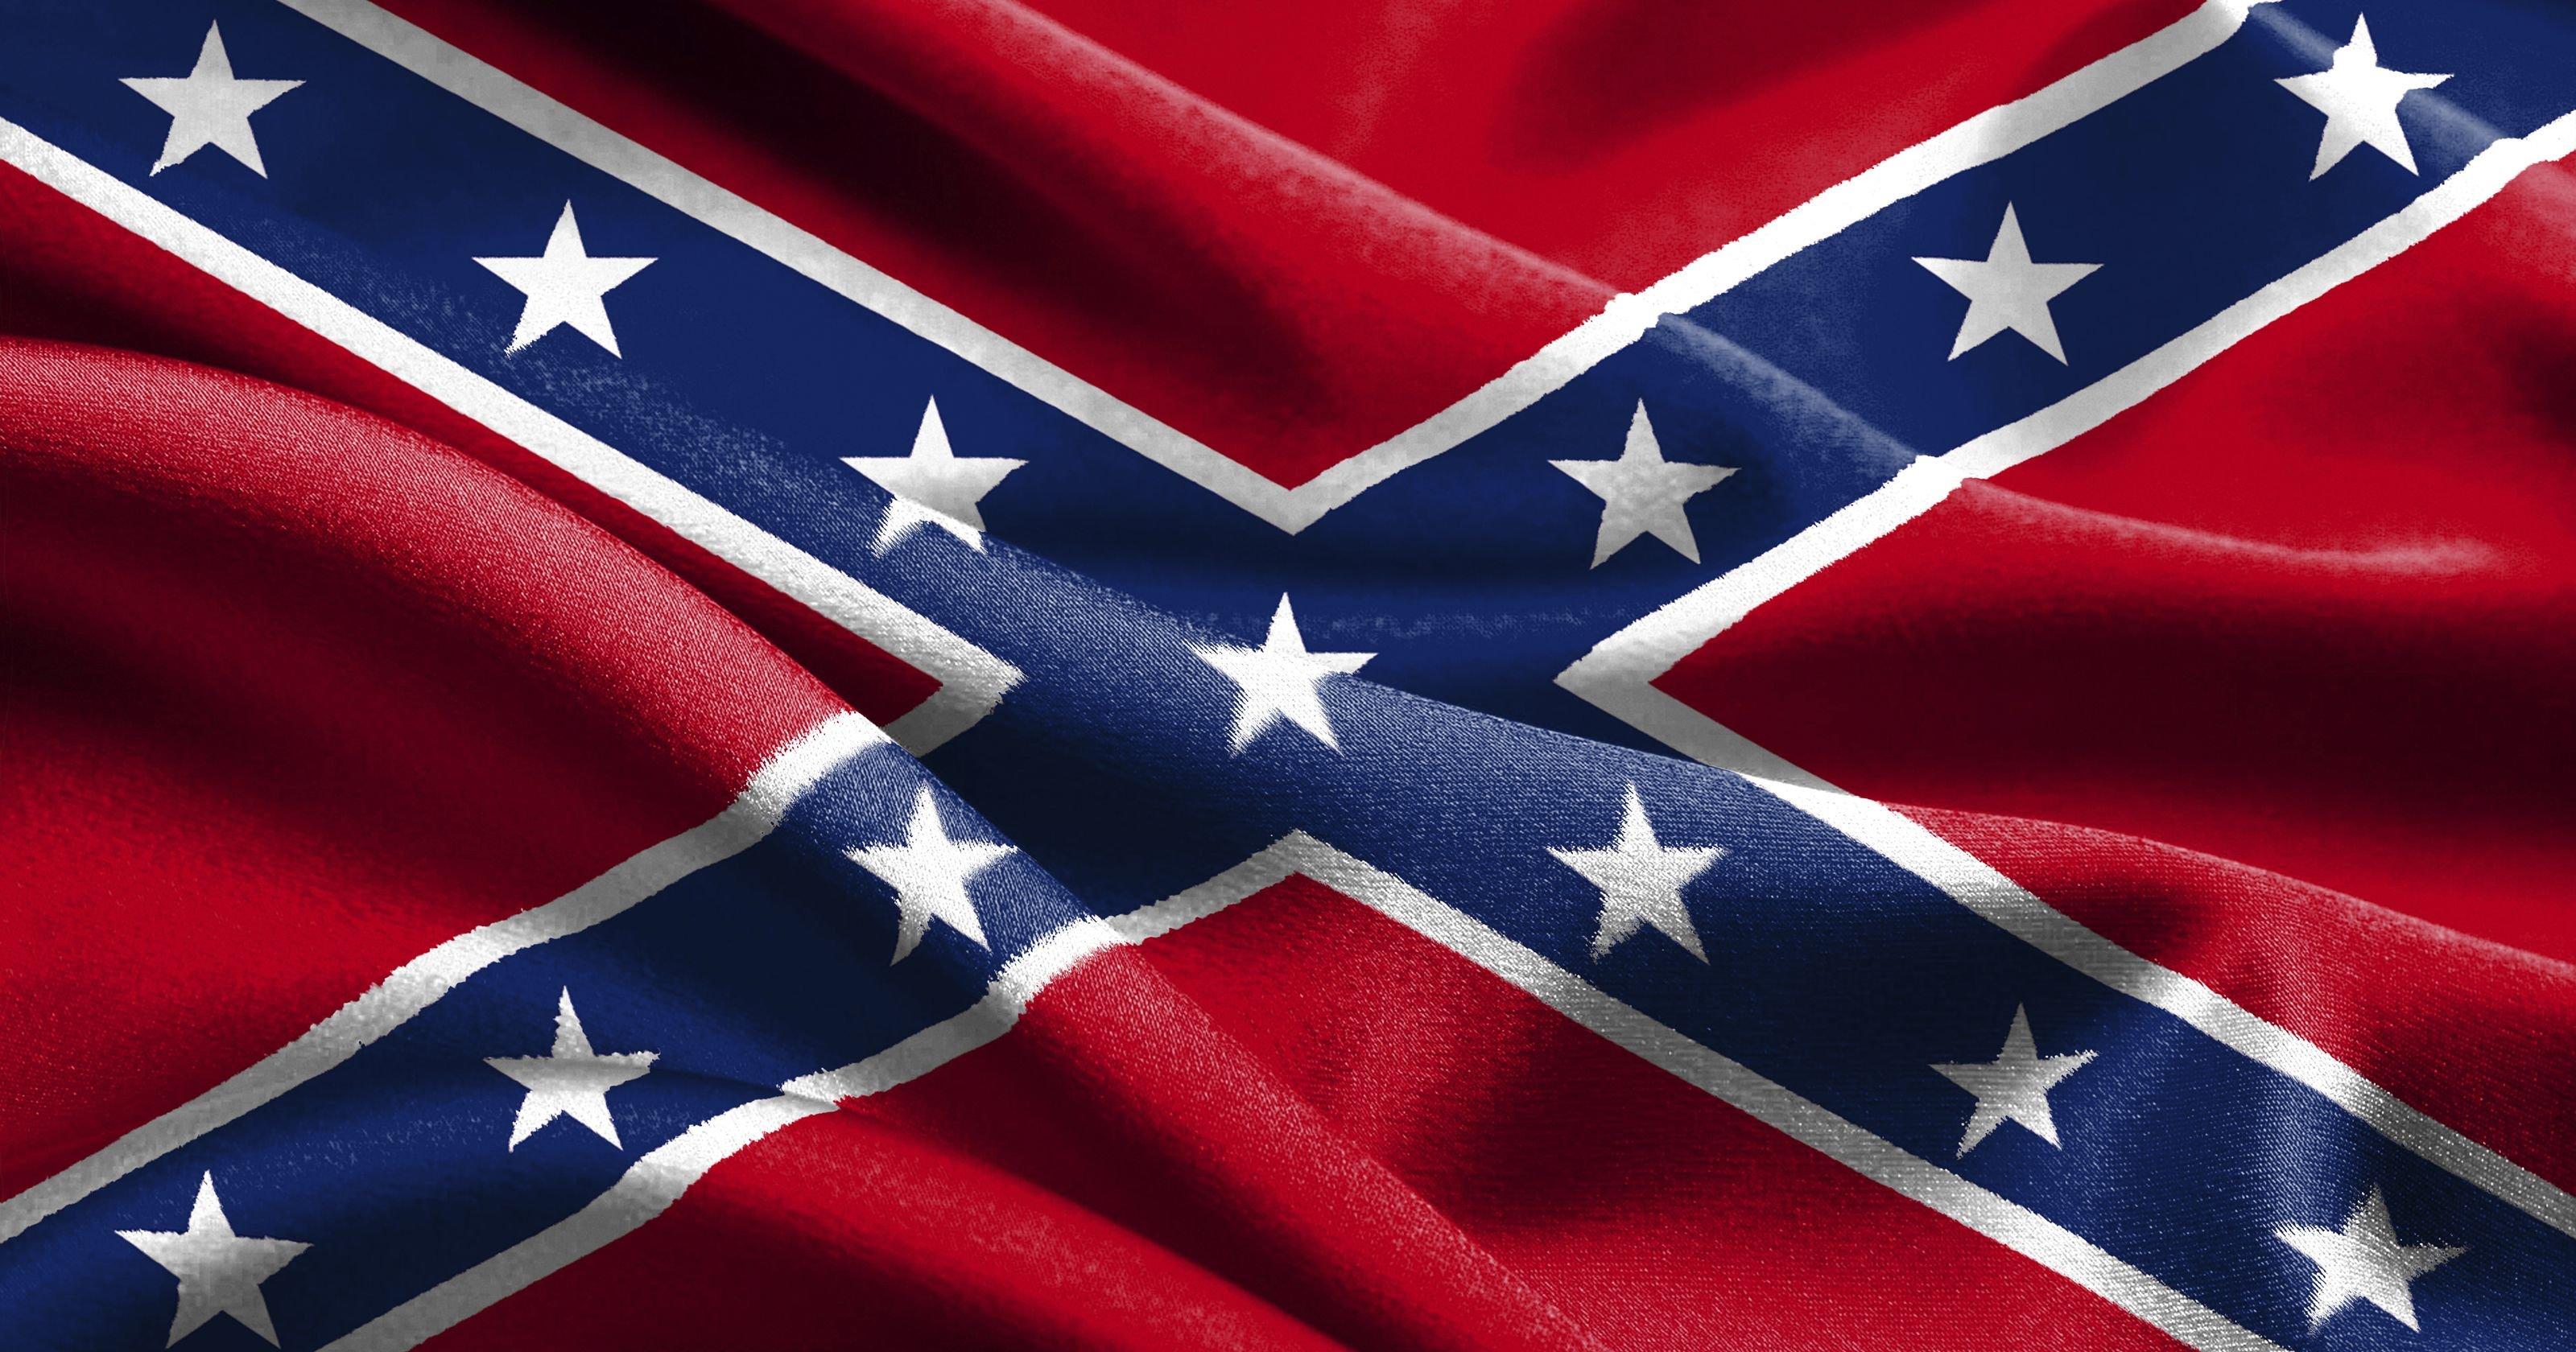 states csa civil war rebel dixie military poster wallpaper background 3200x1680